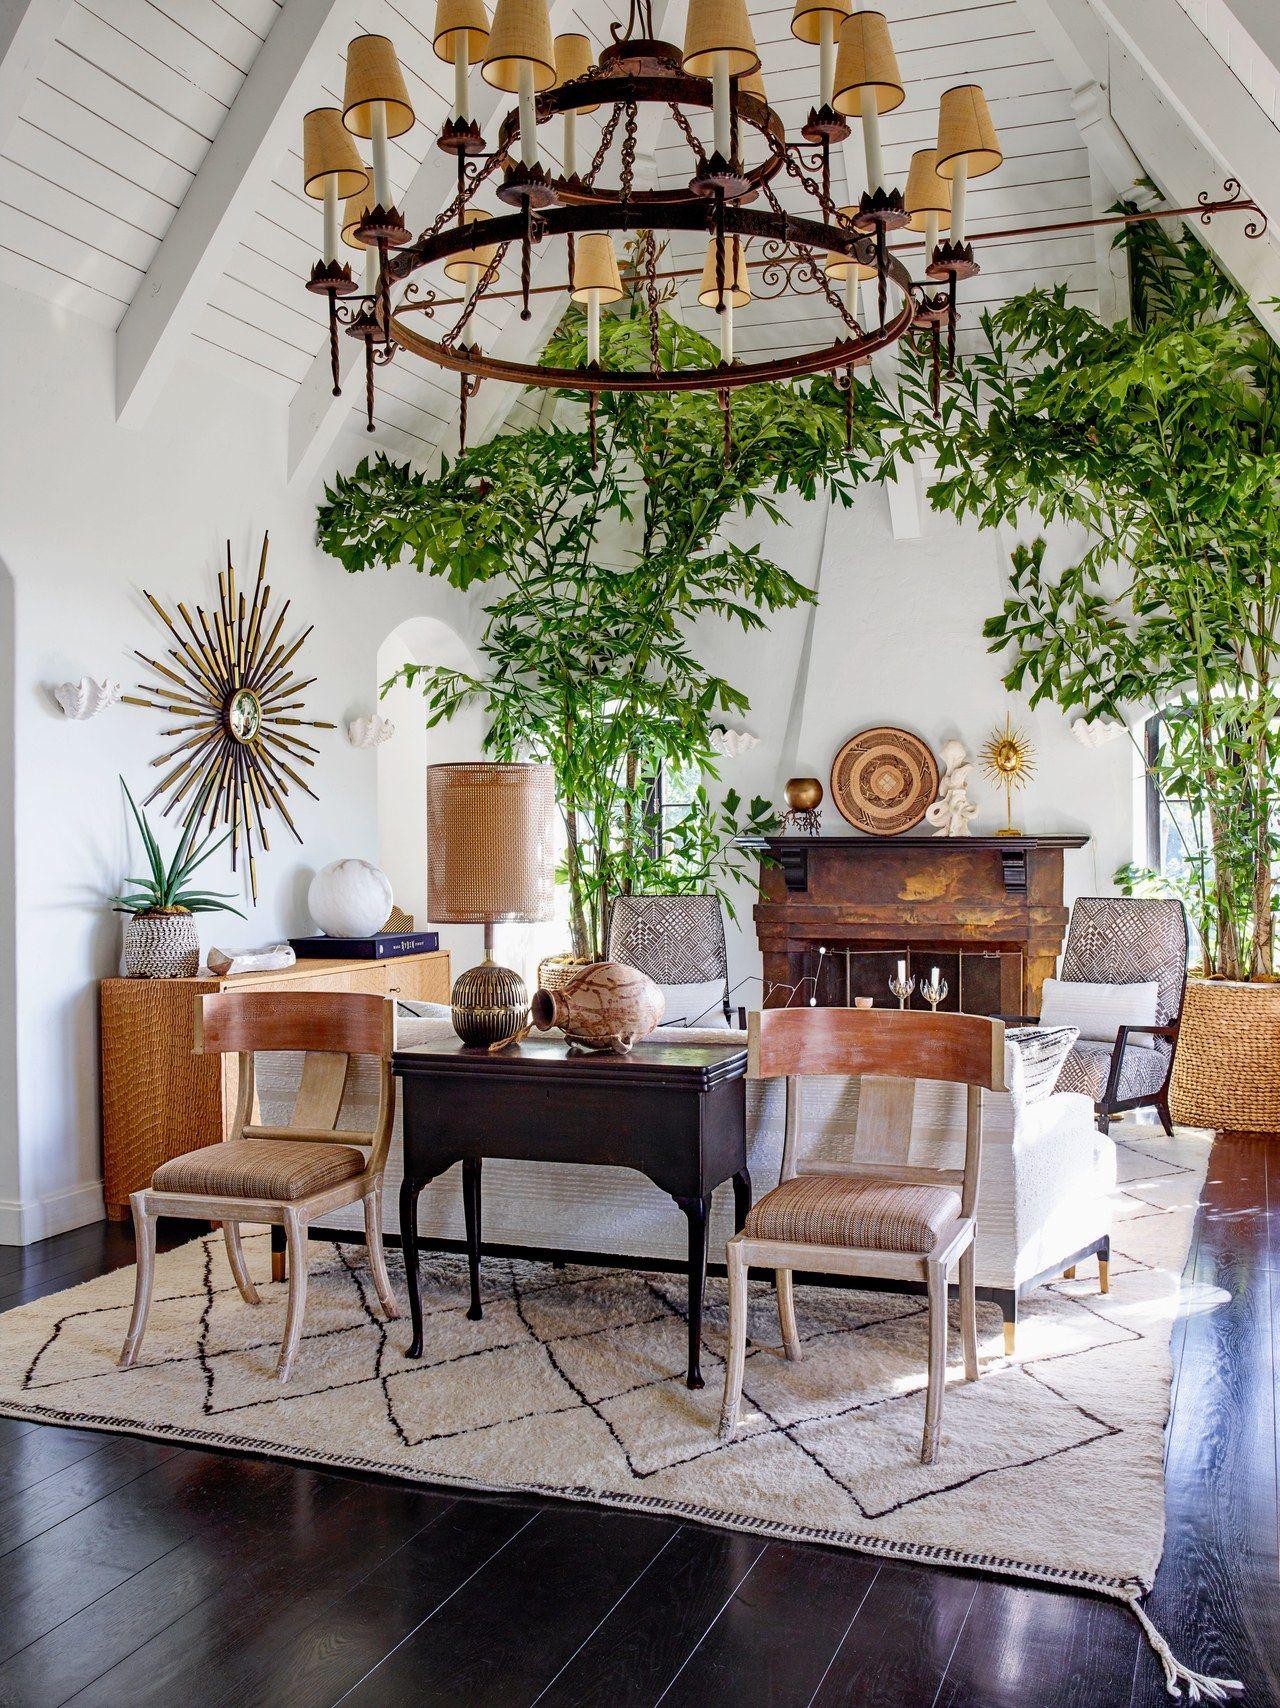 In the living room, Anne Sokolsky designed custom raffia